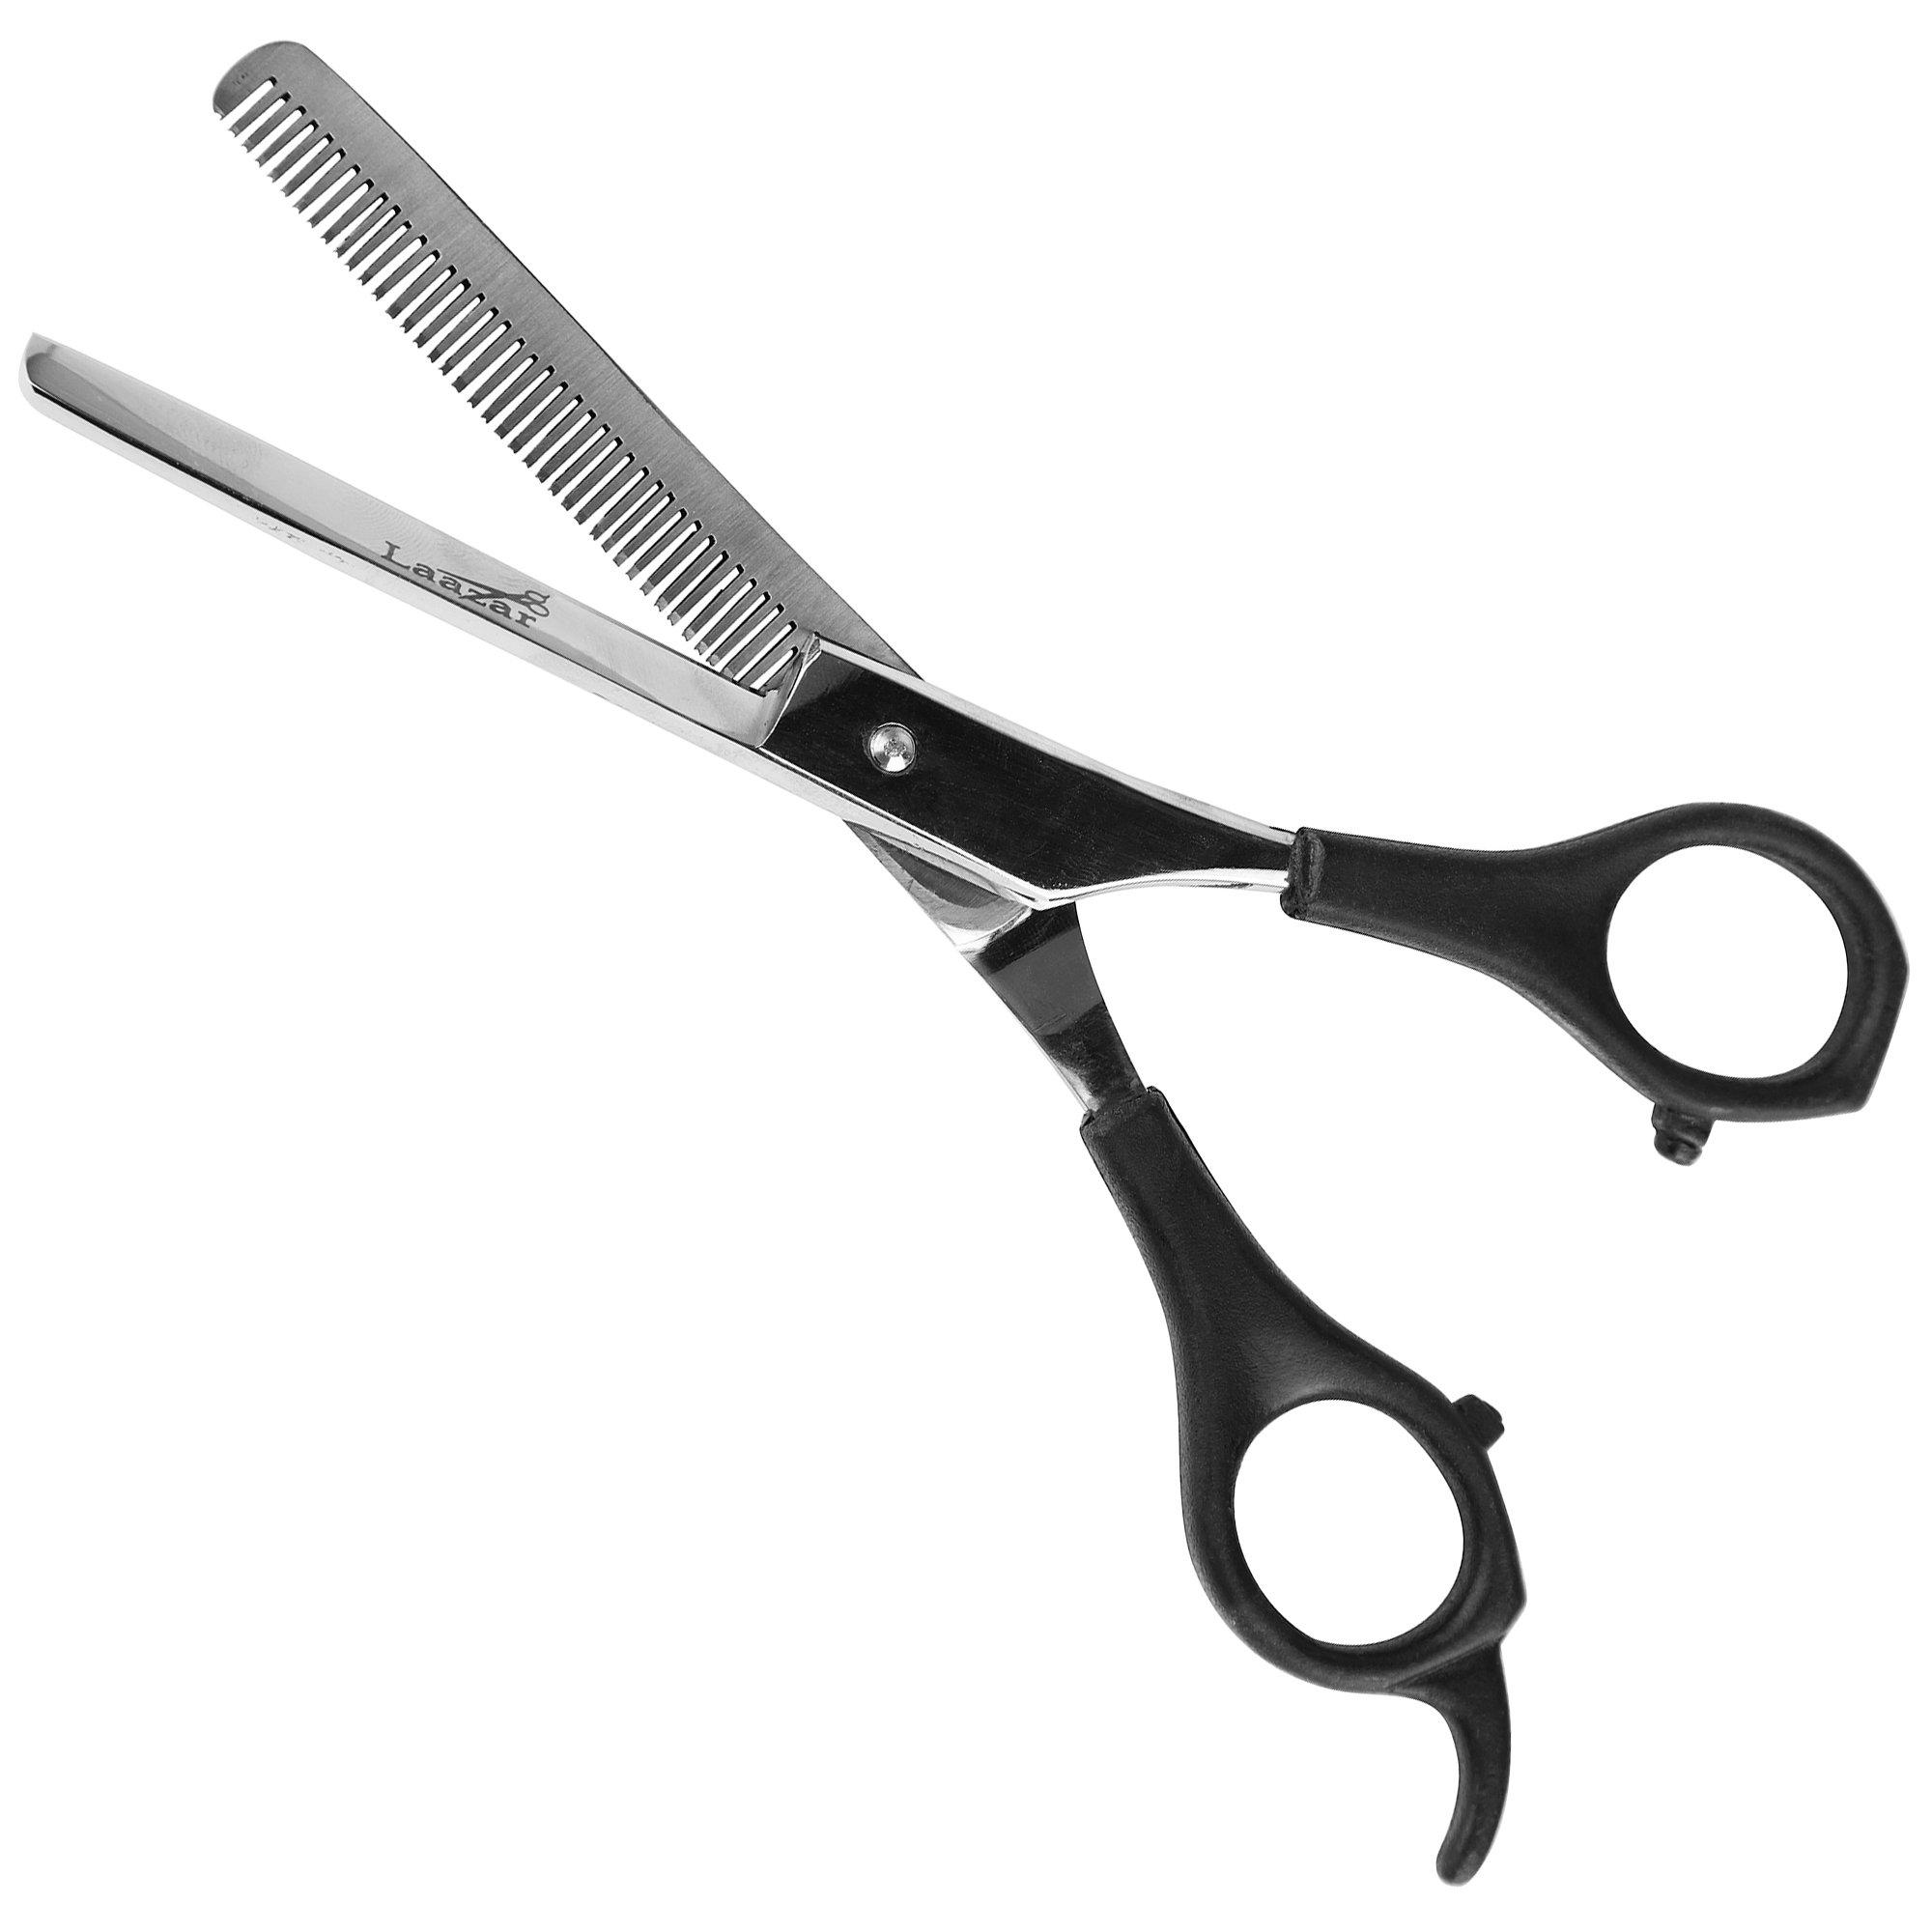 Laazar 6.5'' 42 Teeth Thinning Dog Shear, Pet Grooming Scissors